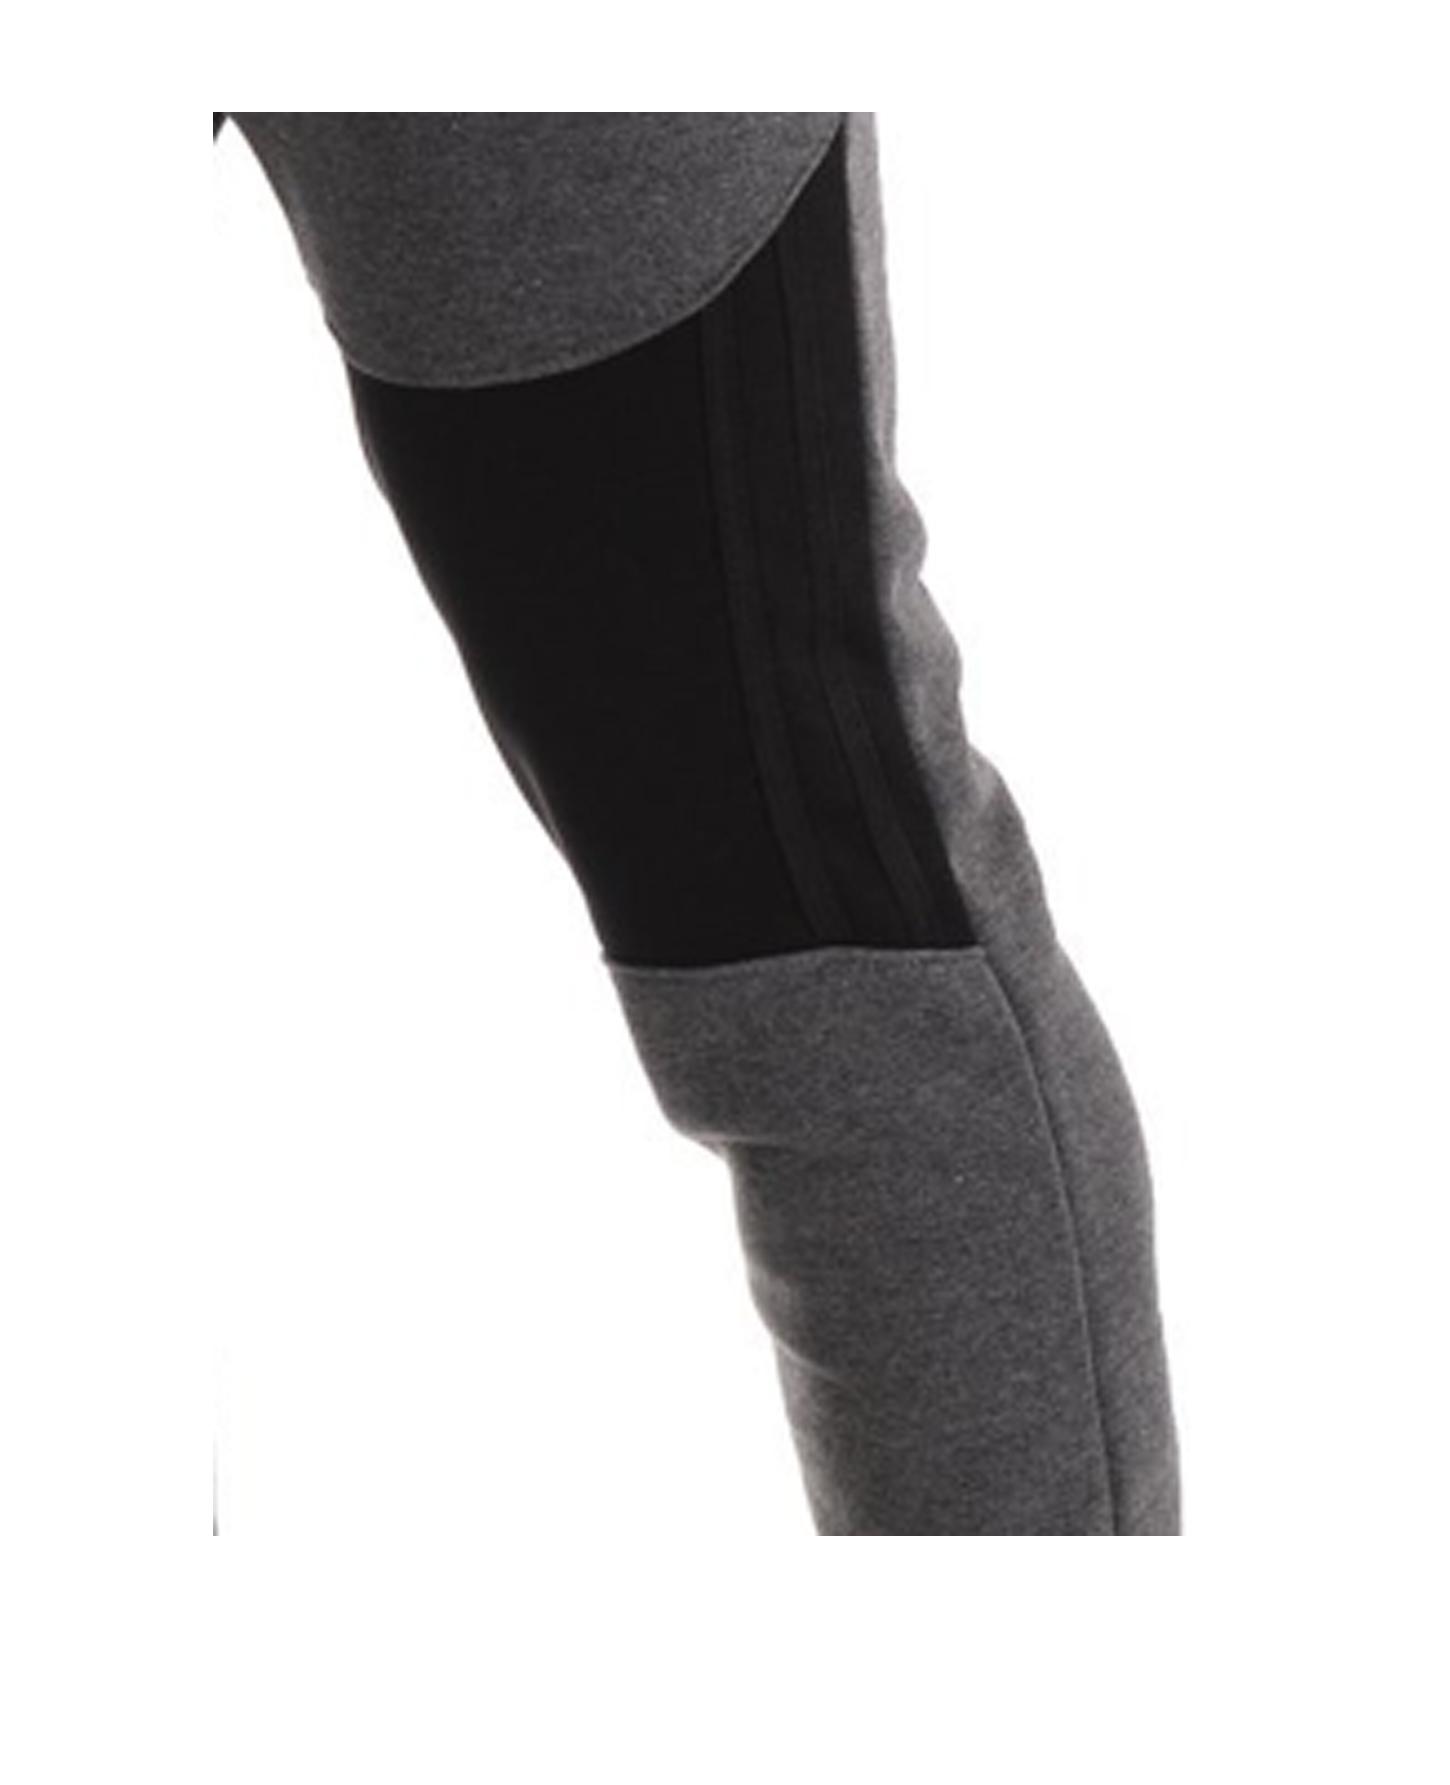 Men's Casual Zipper Stitching Trousers Autumn Pants Sports Jogging Pants 2020 New Men's Pants Tight Long Cotton Pants Sports Pants 4